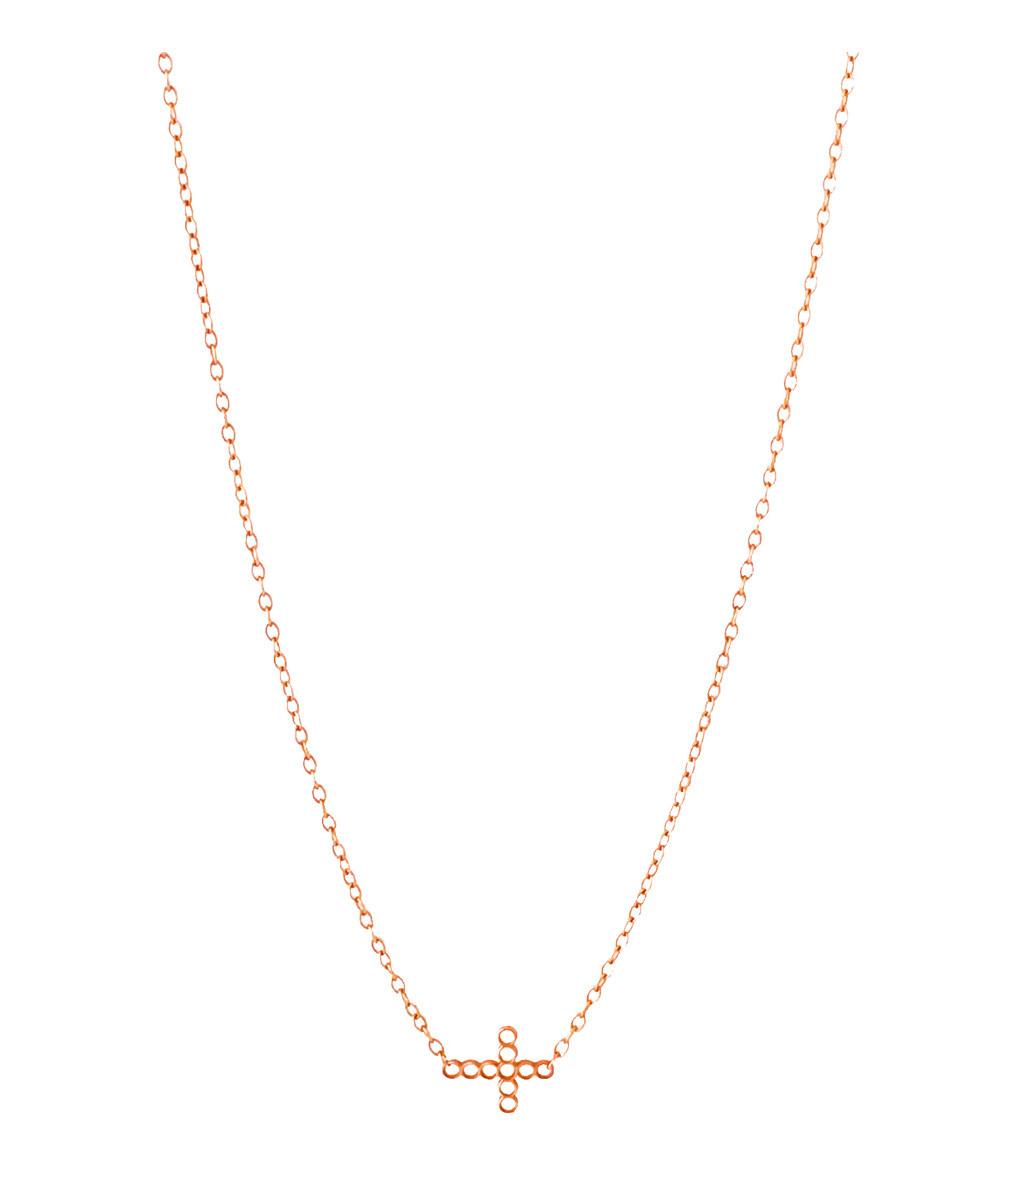 Collier Chaîne Or Trancoso - CHIBCHA